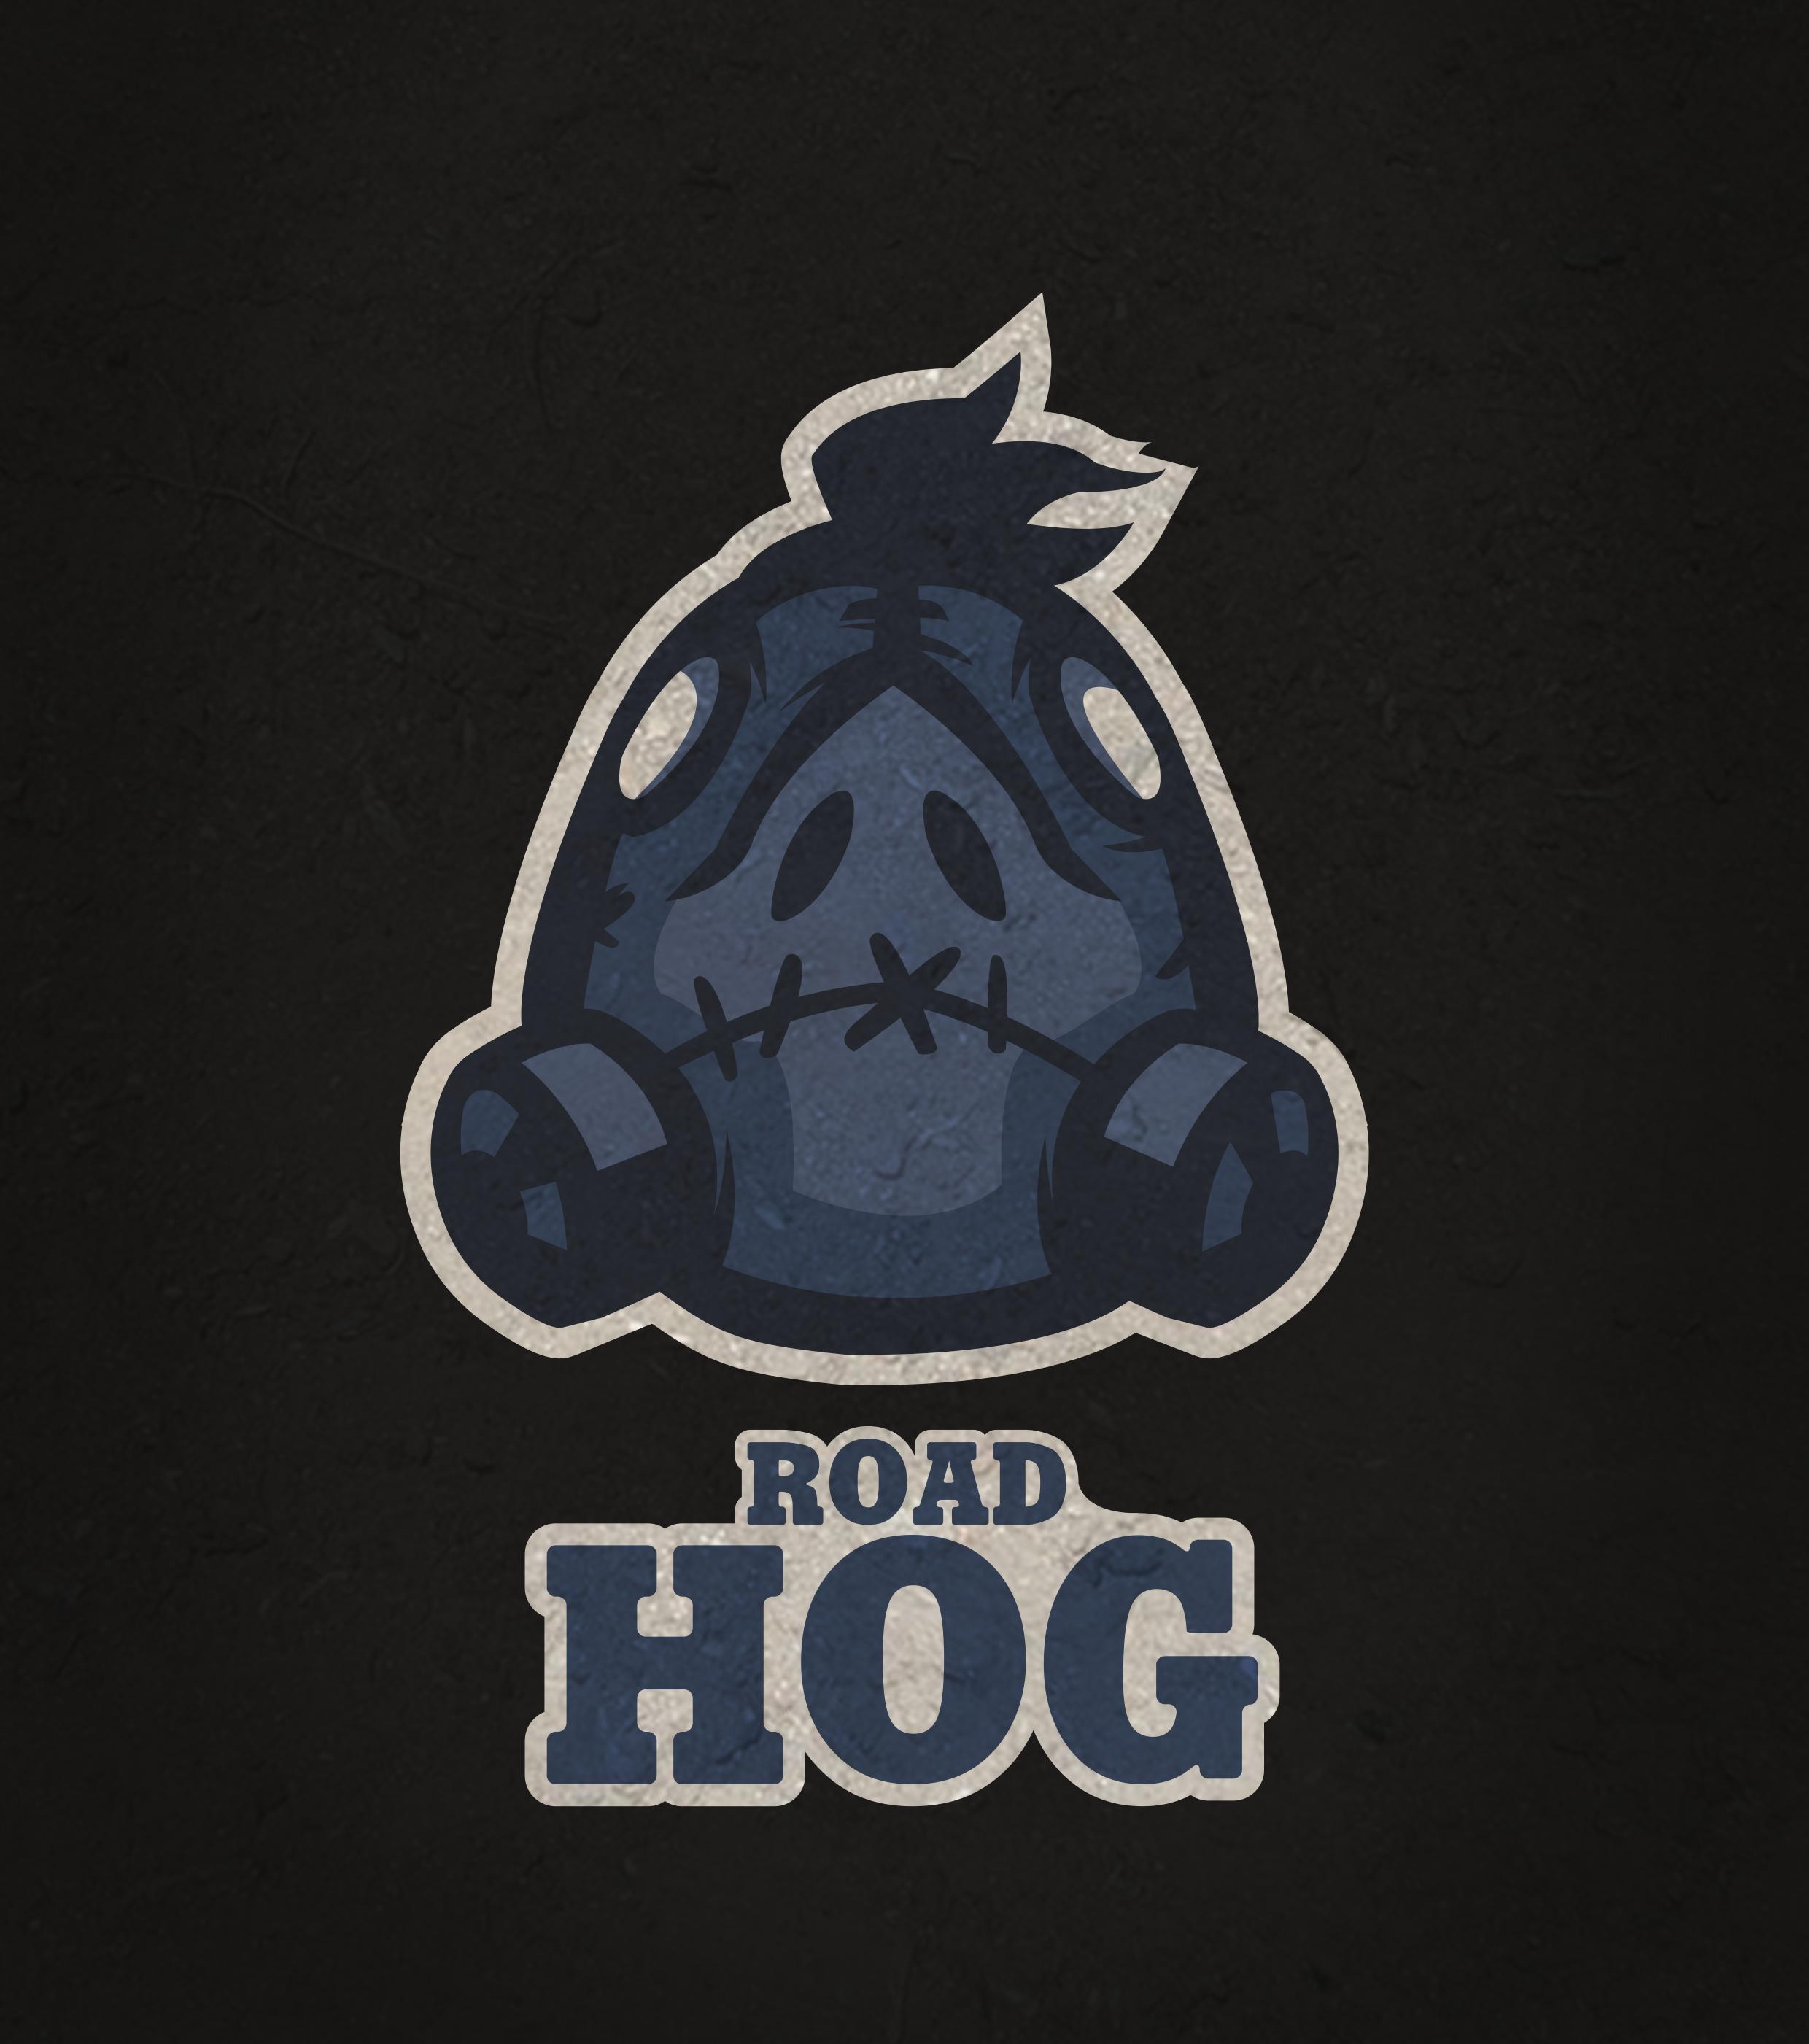 Overwatch Roadhog.